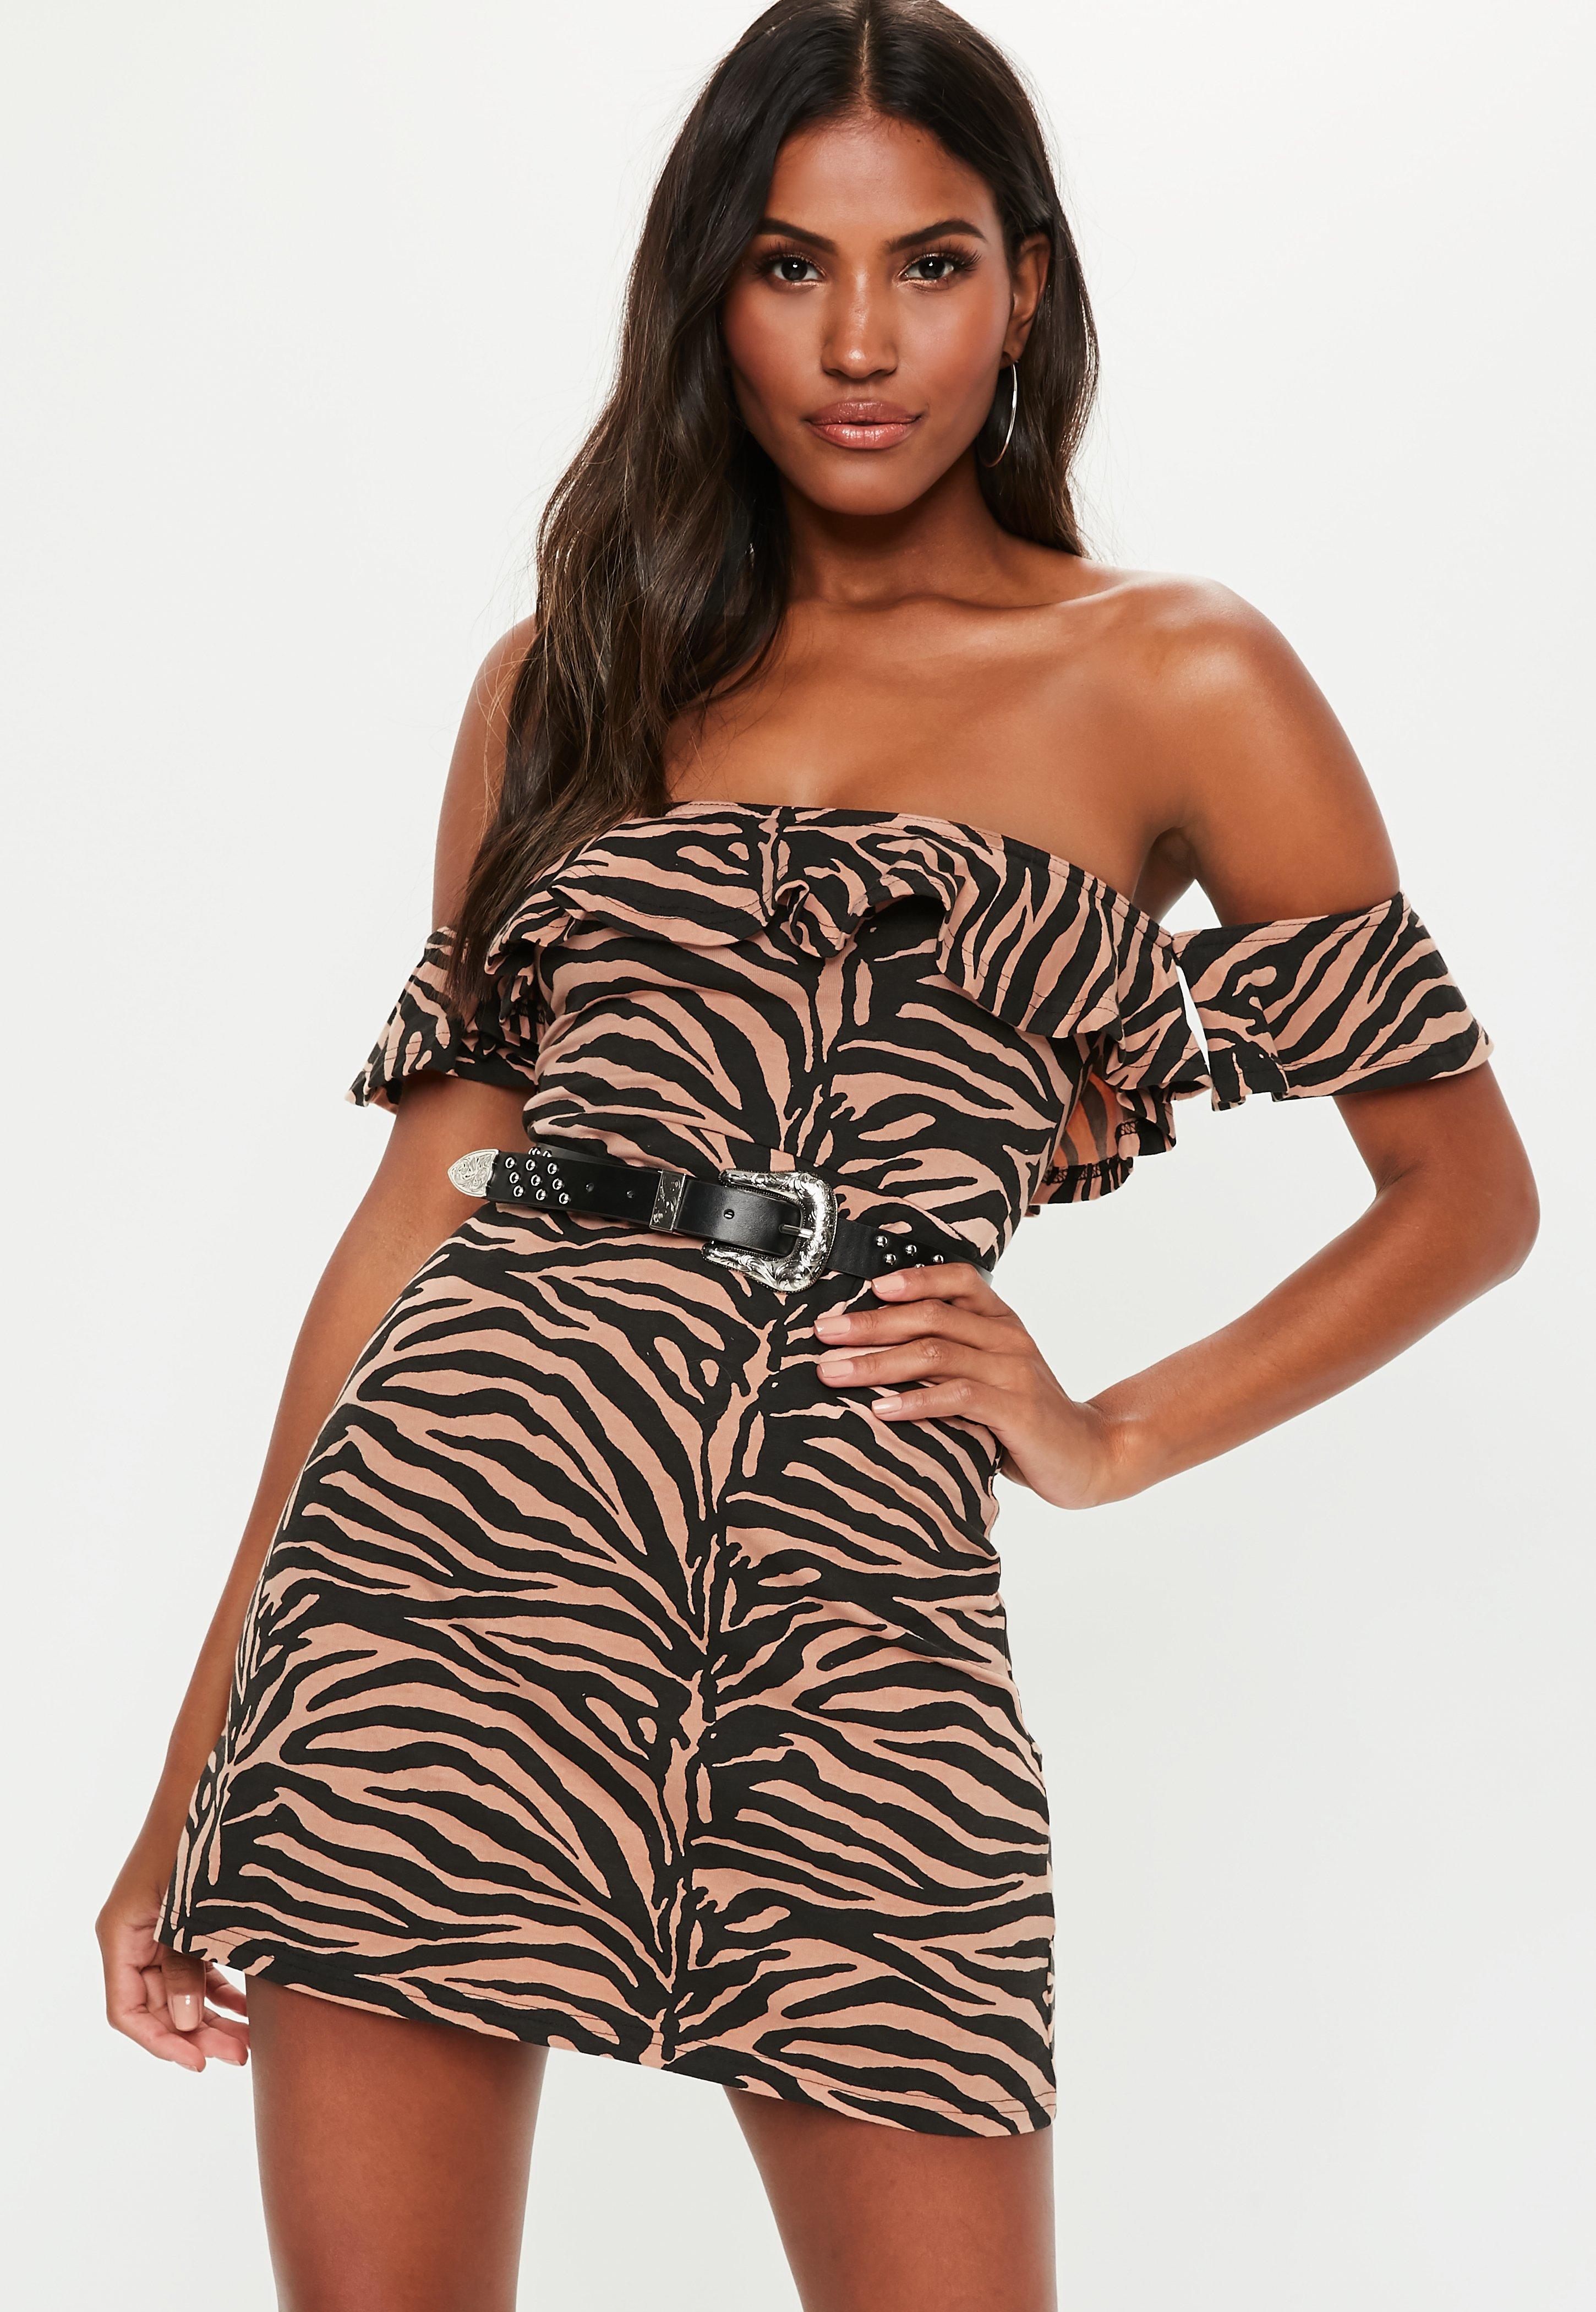 554bdafe388 Missguided - Multicolor Rust Zebra Print Bardot Jersey Skater Dress - Lyst.  View fullscreen